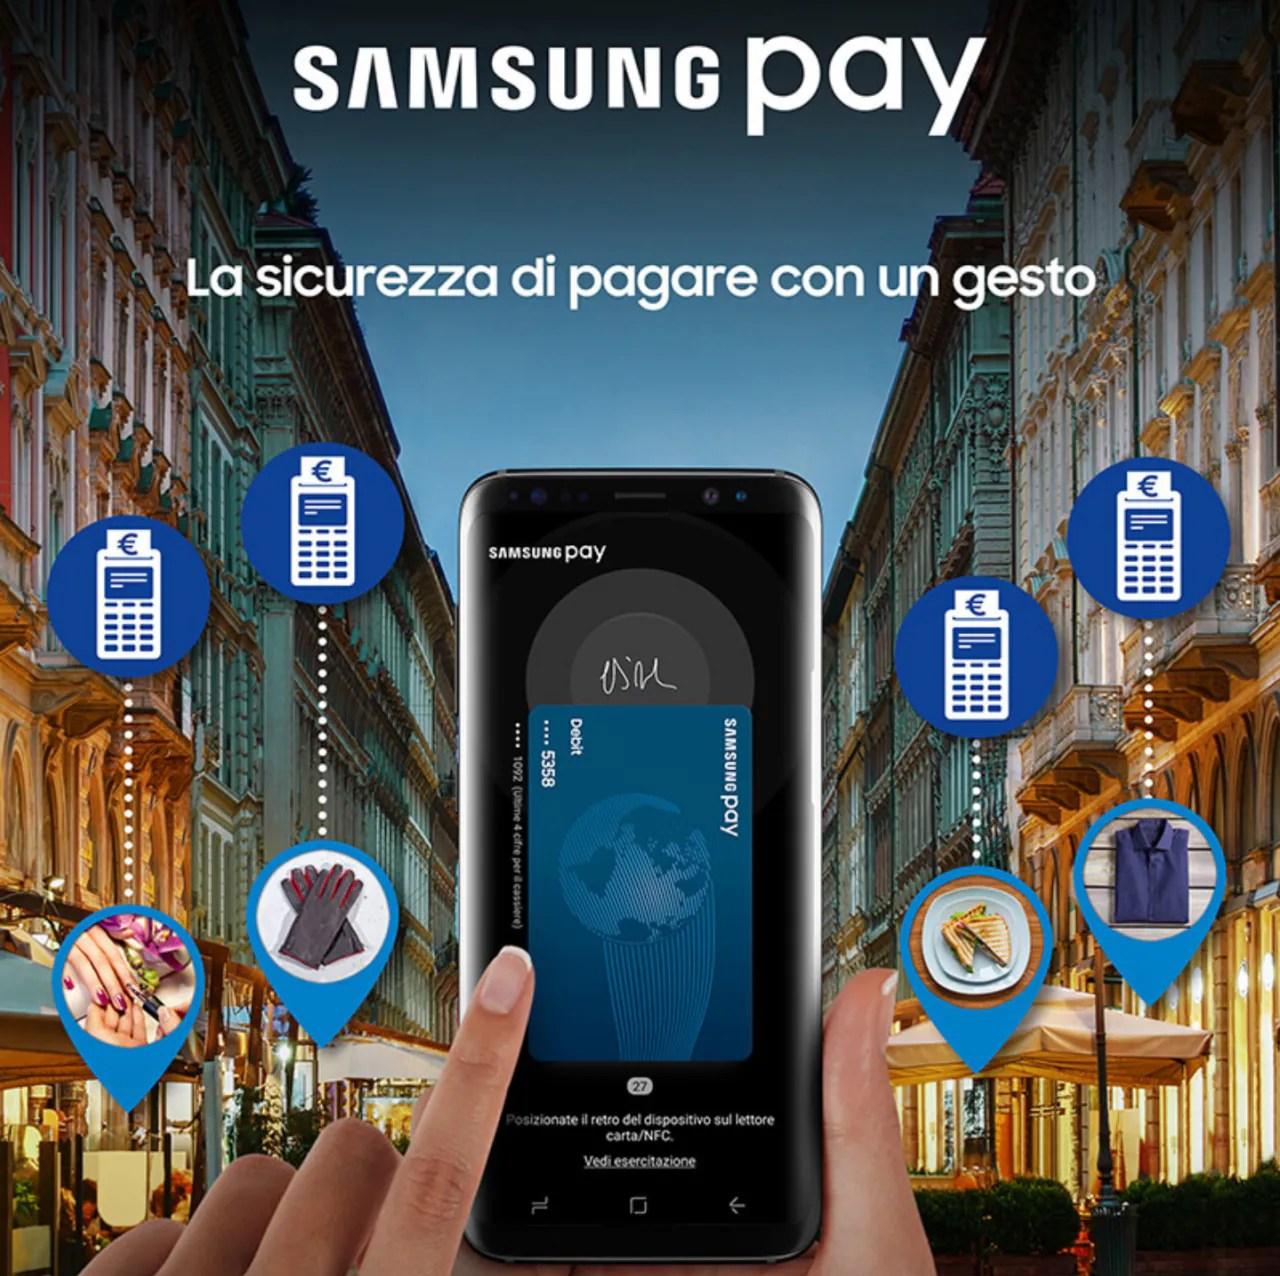 Samsung Pay Italia Banche E Carte Supportate App E Apk